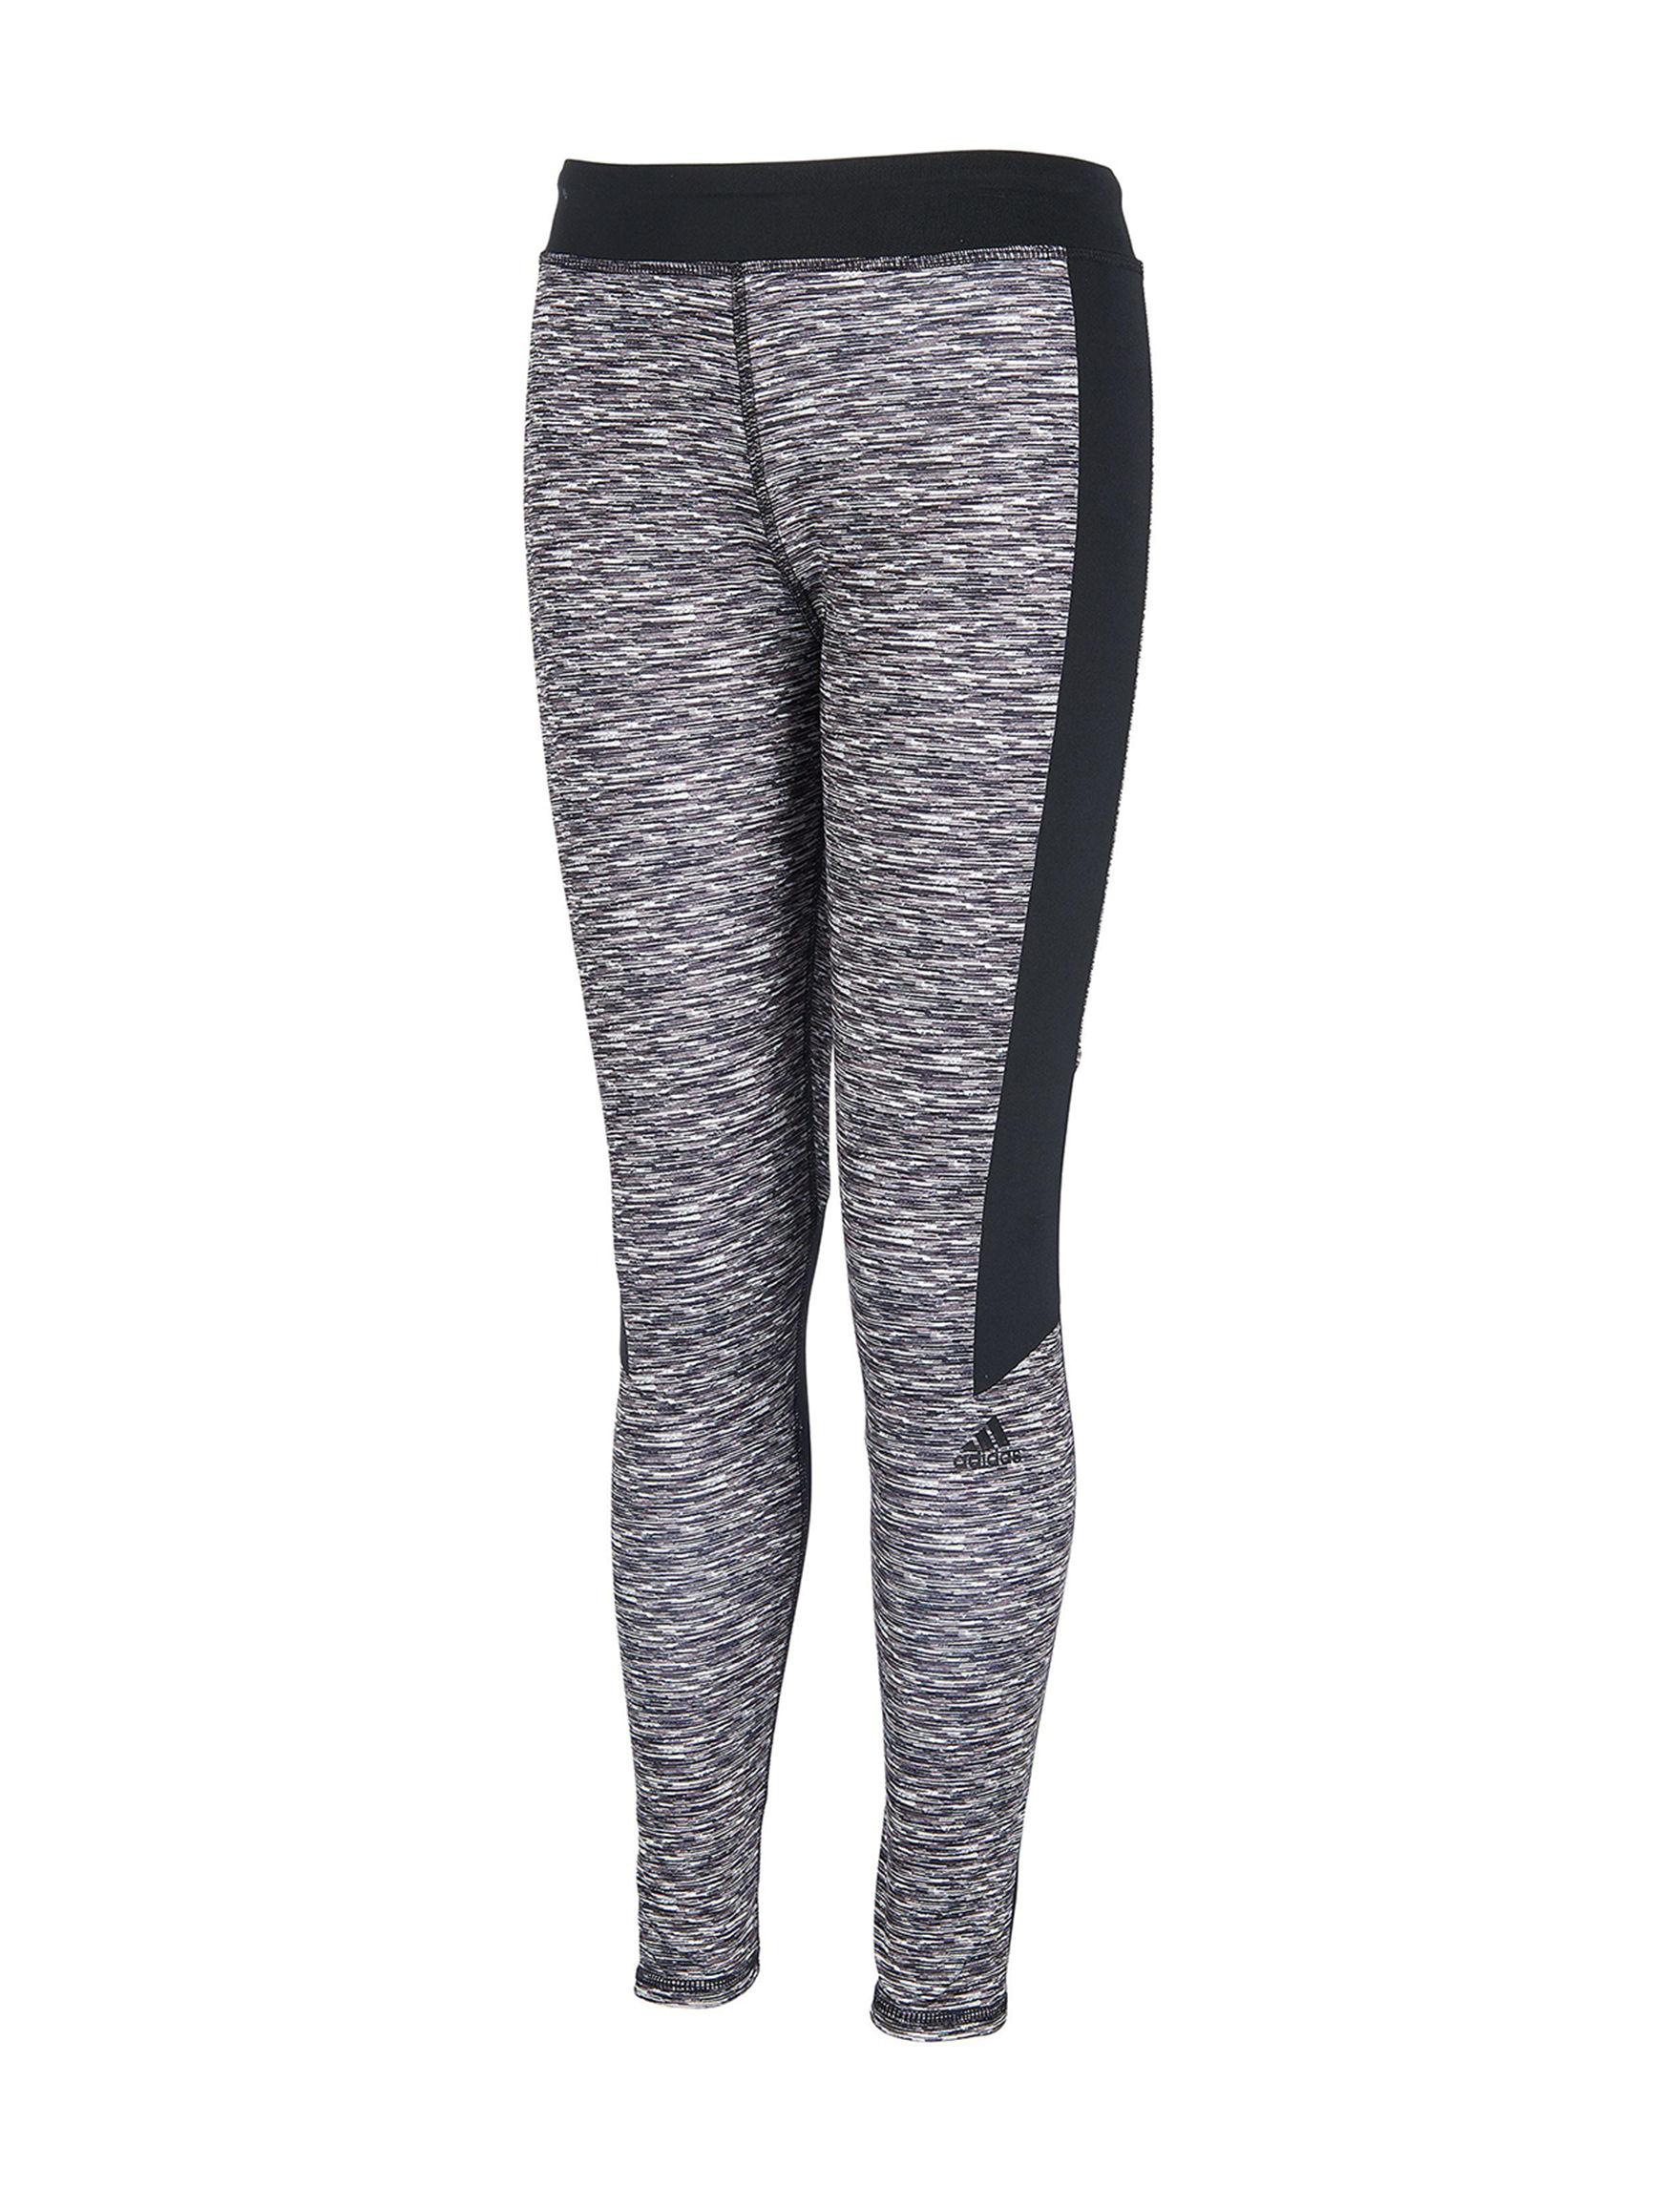 Adidas Grey Multi Leggings